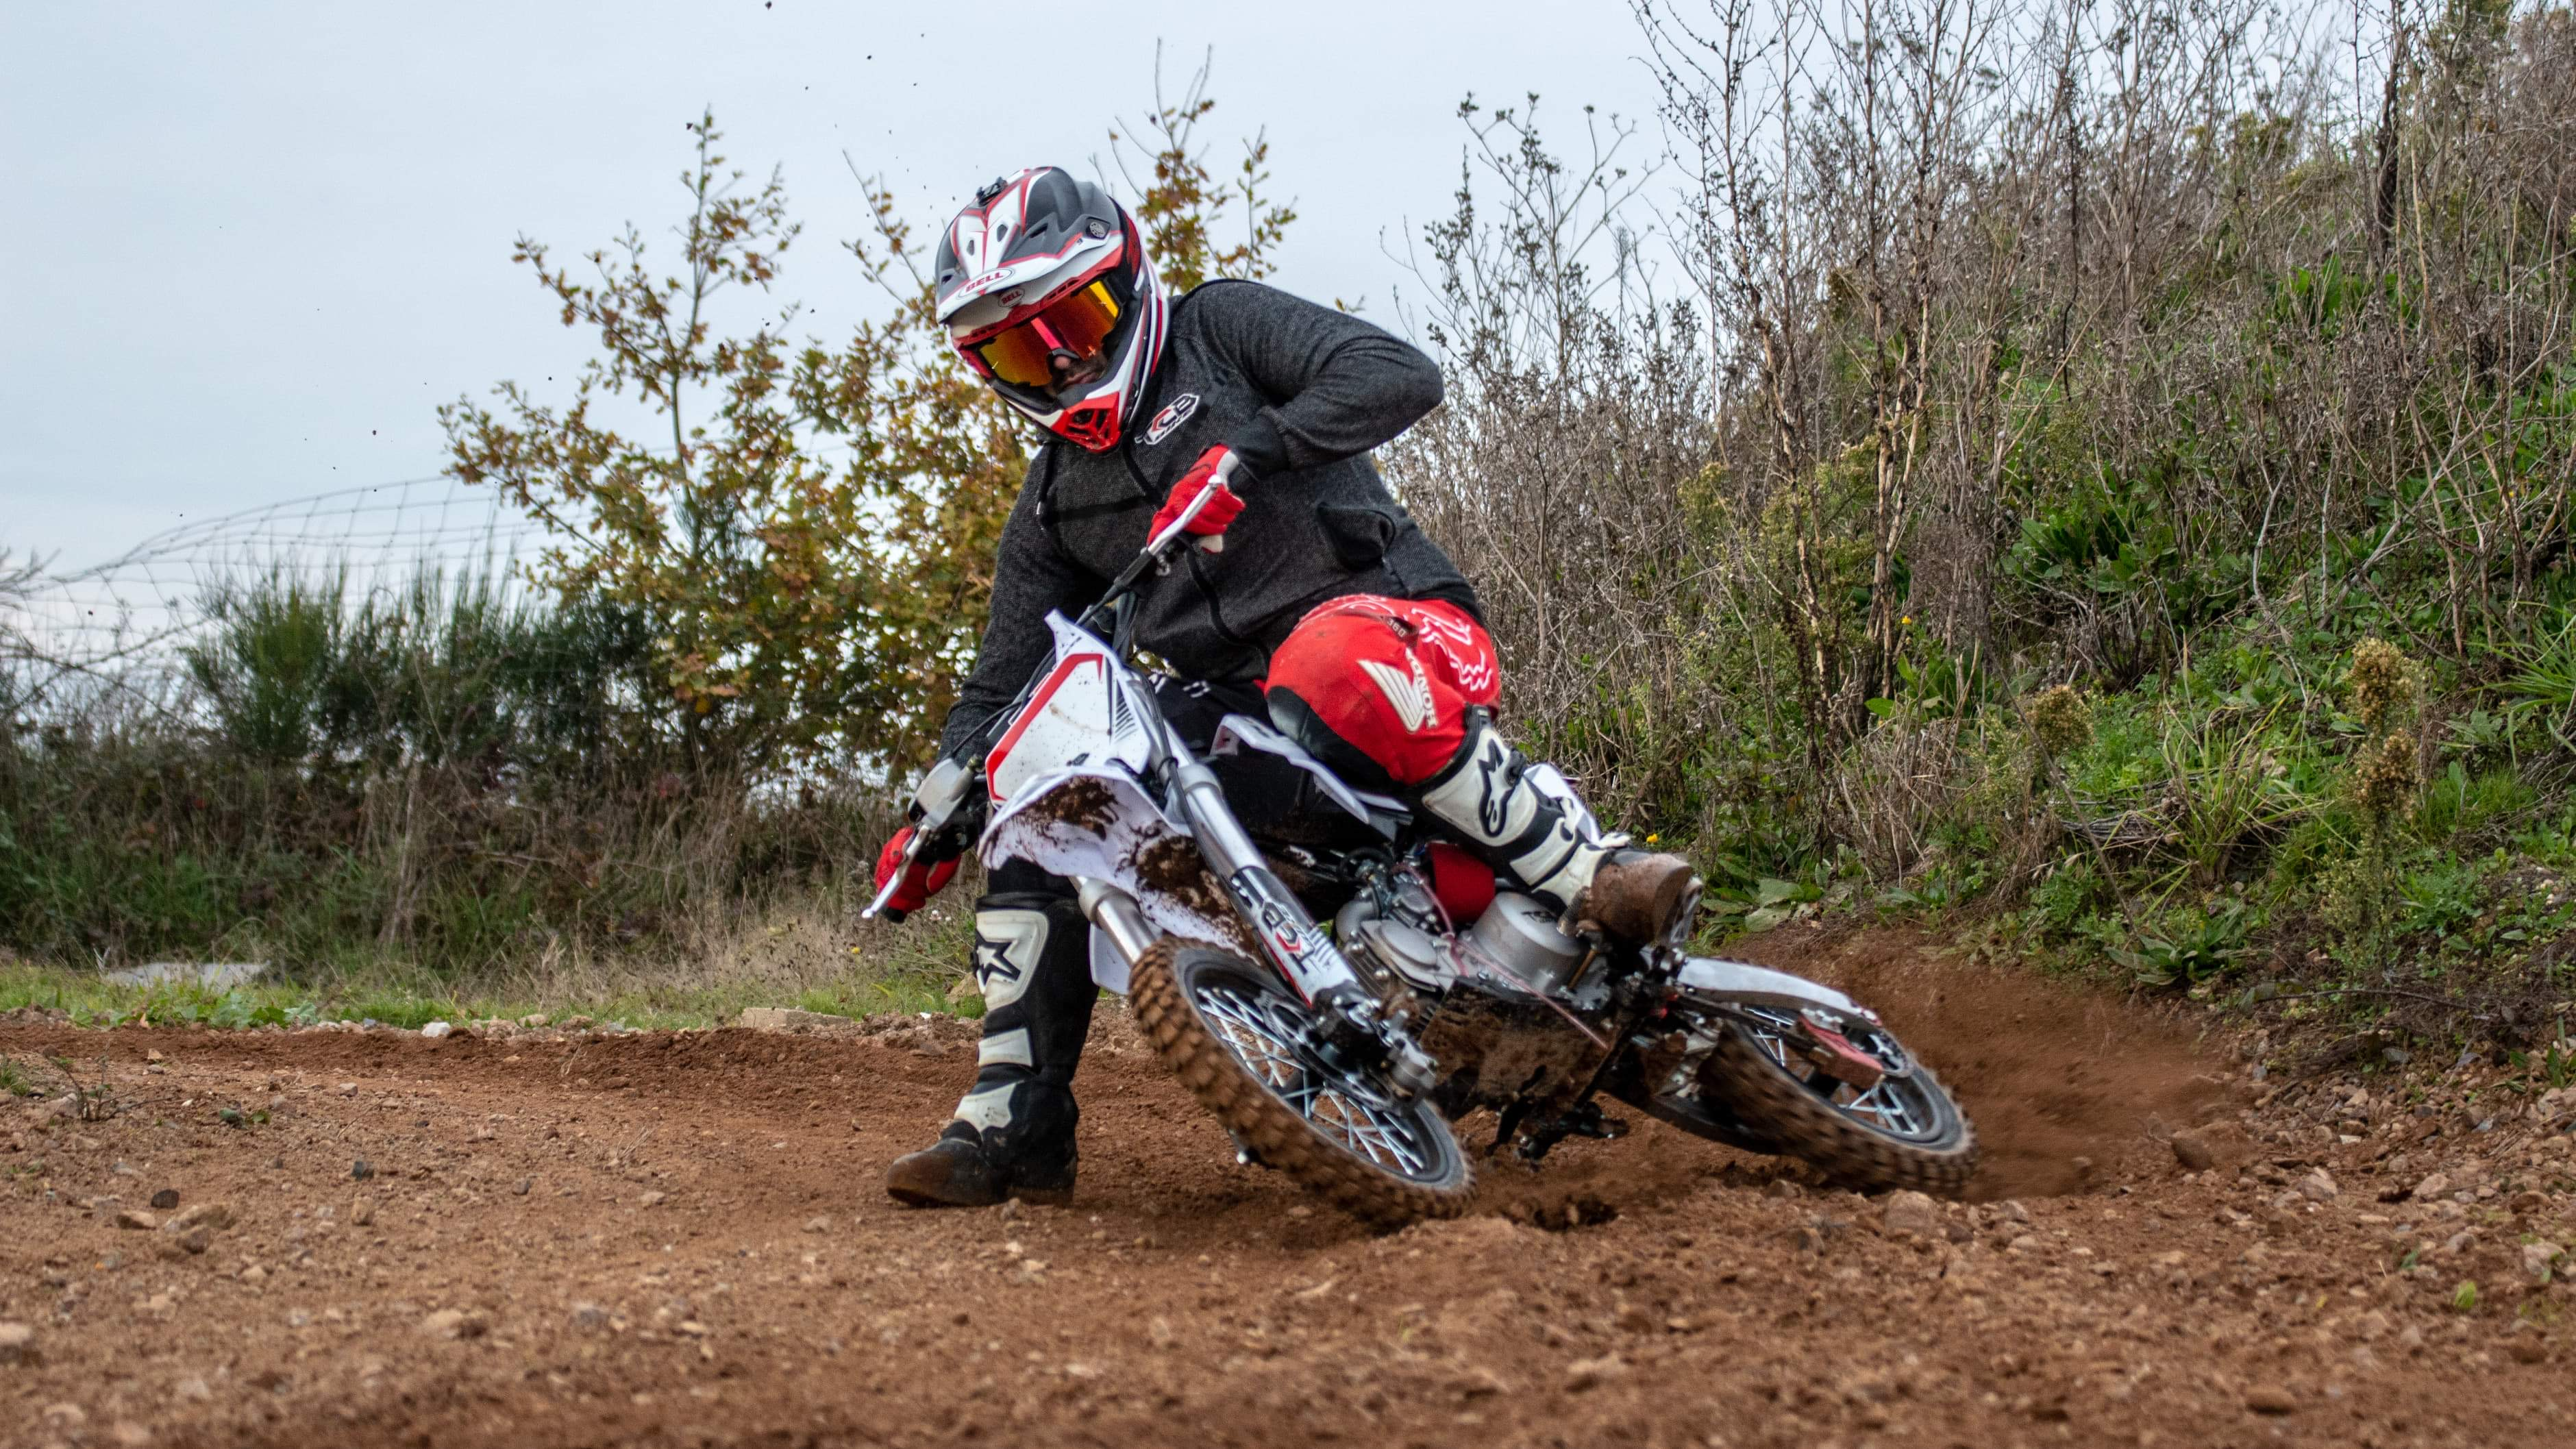 XF125 en action dirtbike